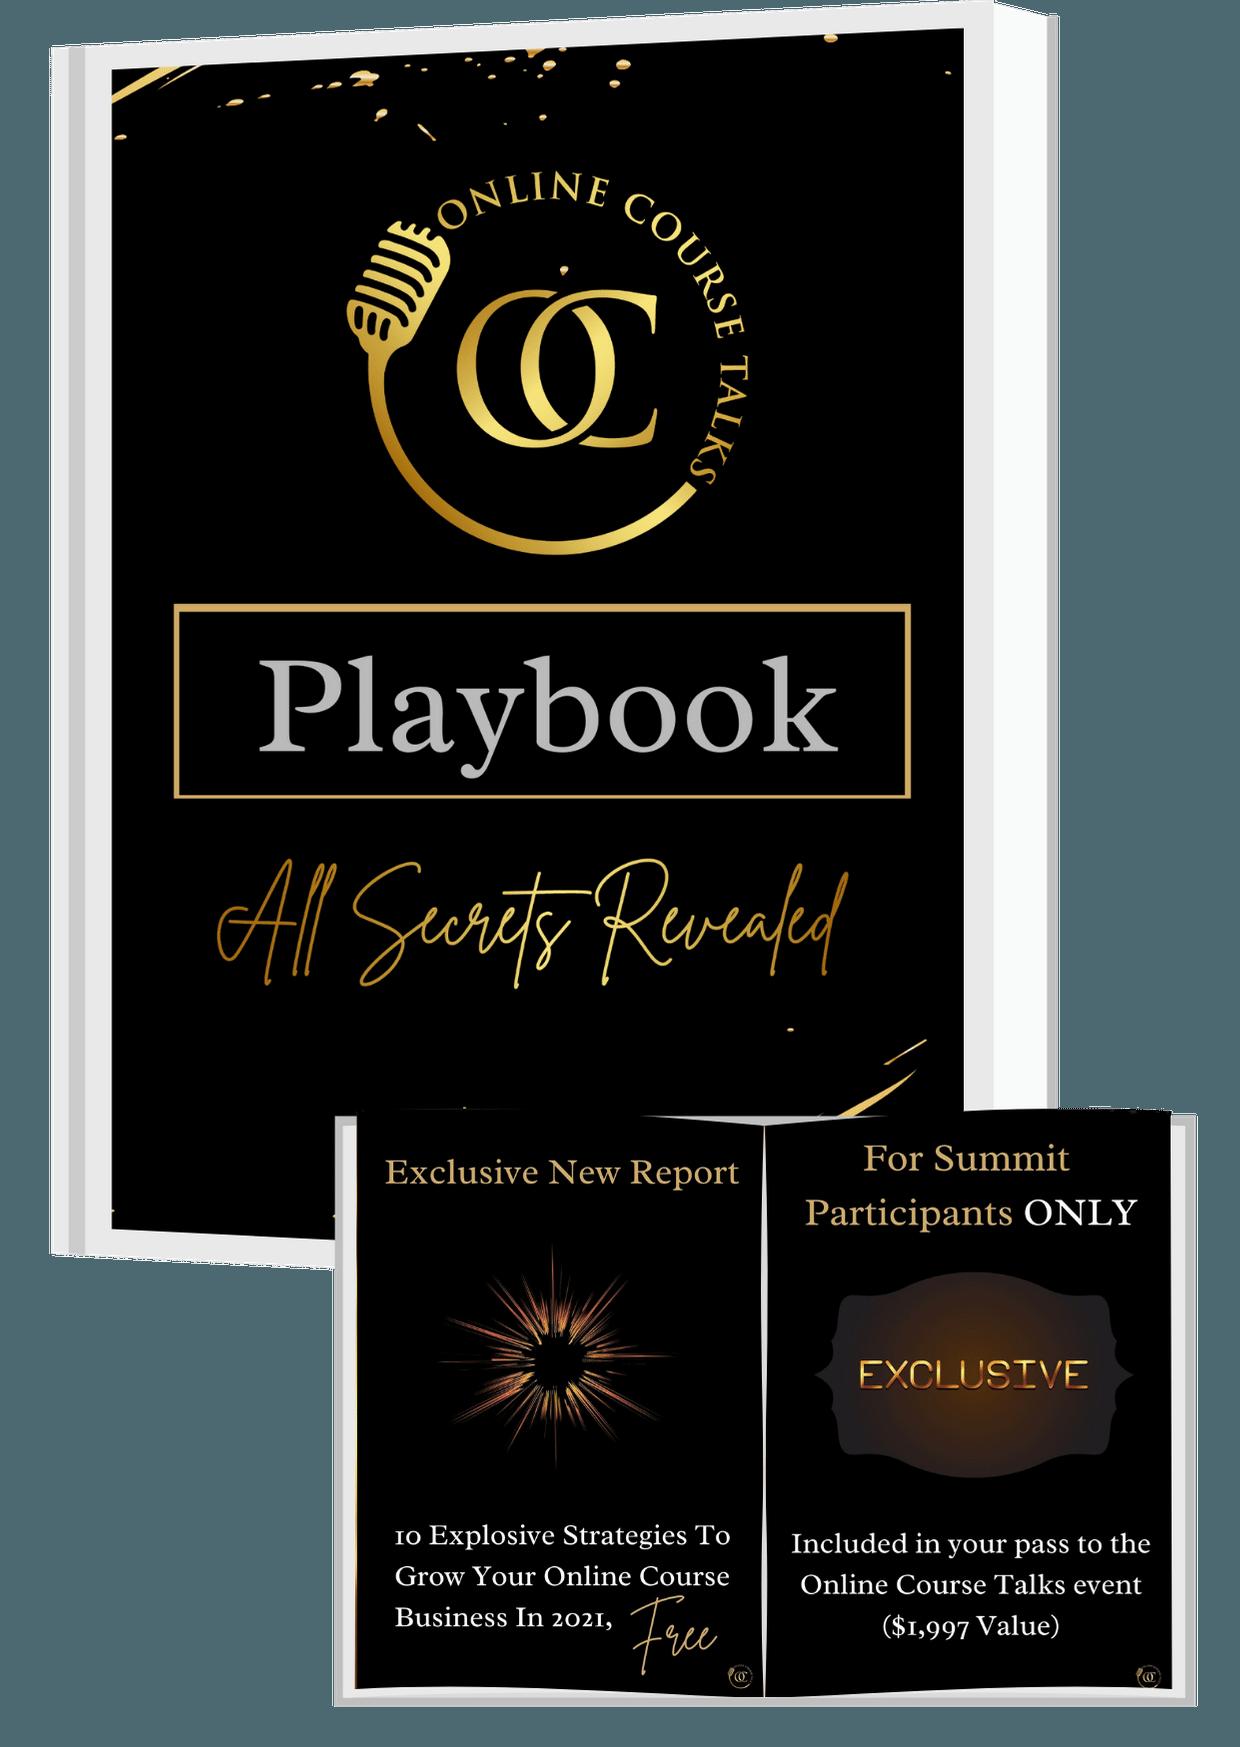 Playbook (3)